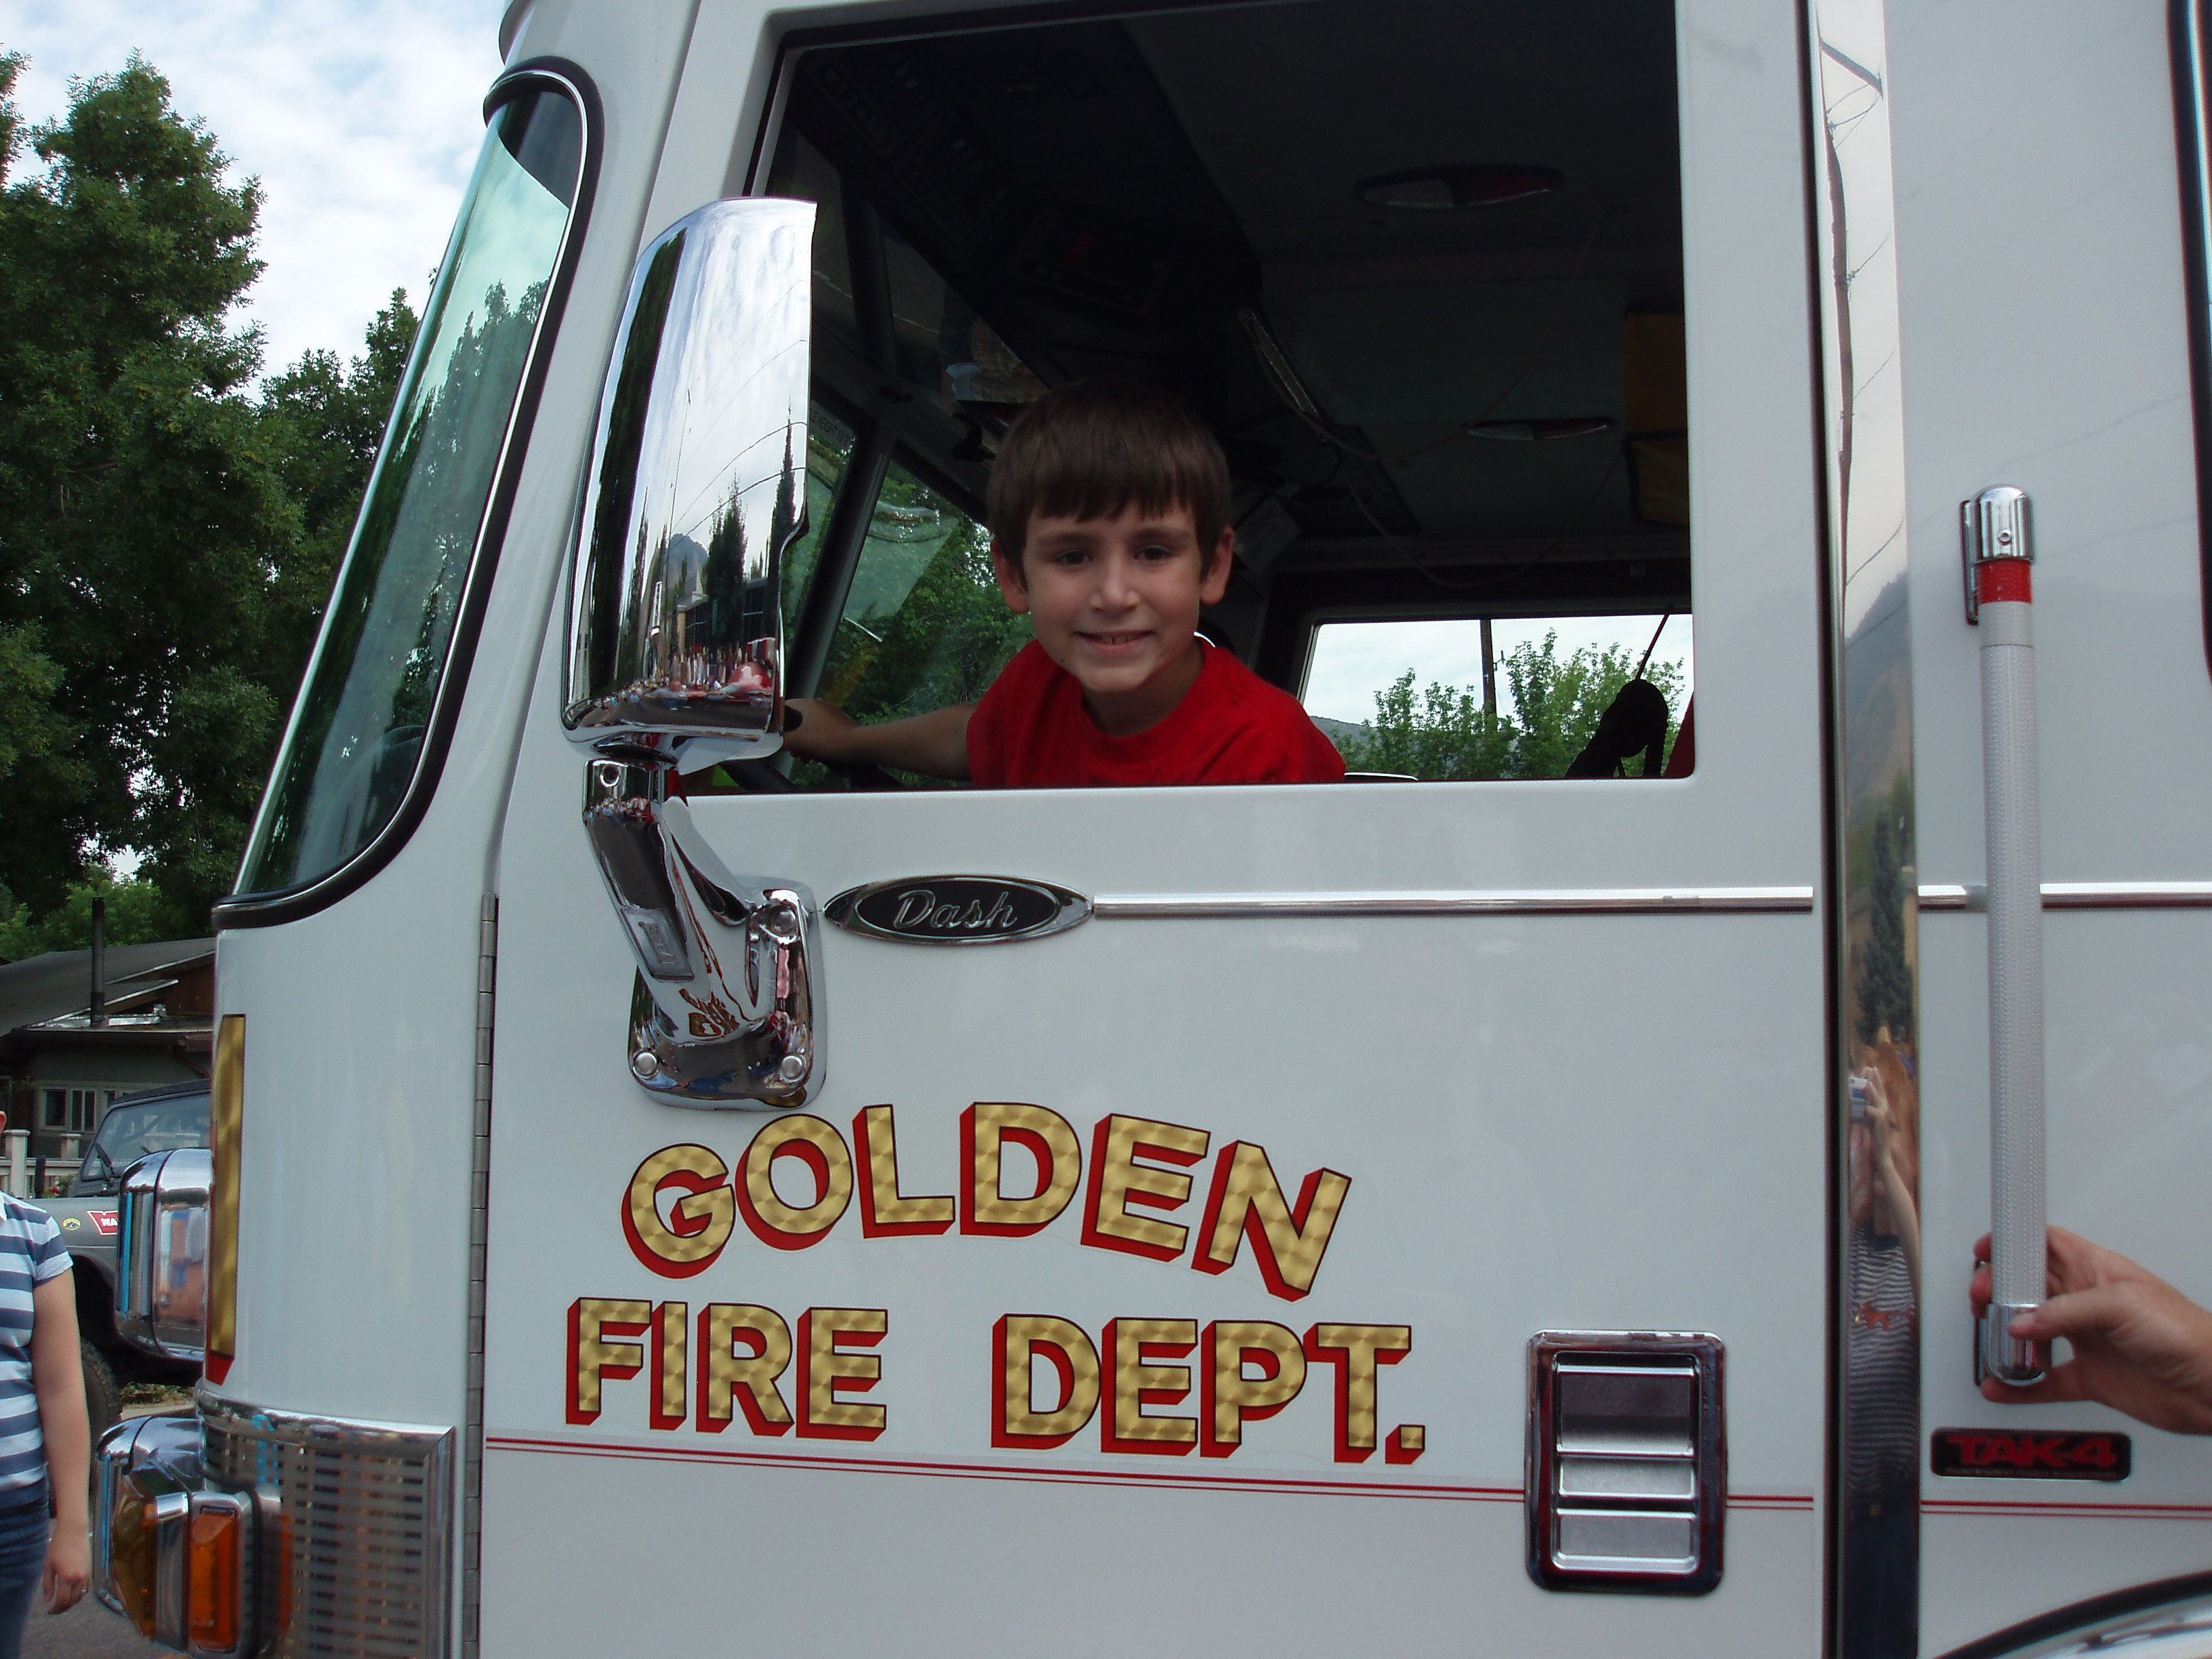 In Uncle Matt's Fire Engine